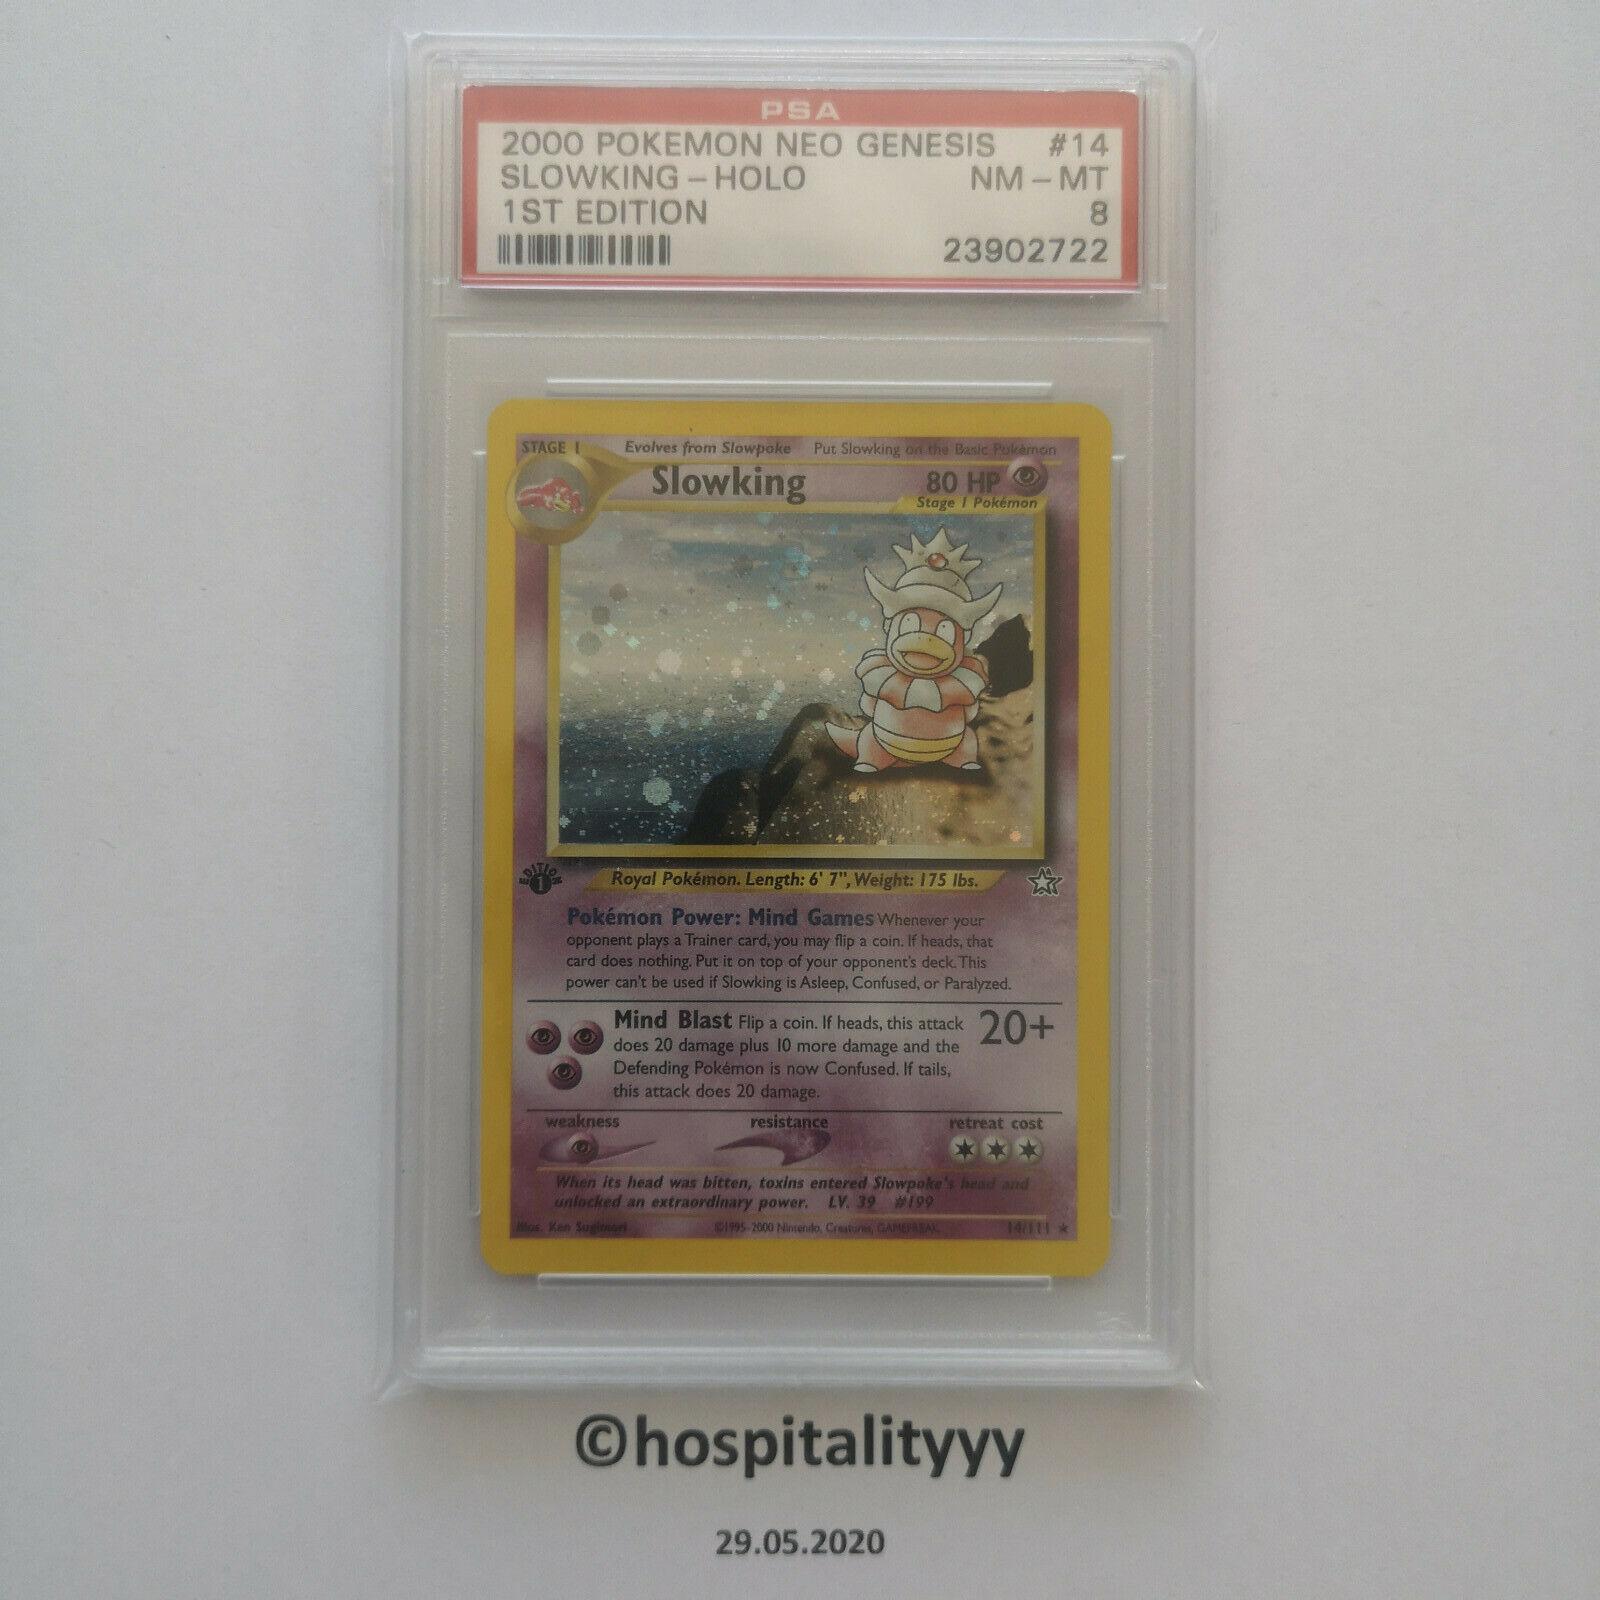 Pokemon Slowking 1st Edition PSA 8 Holo Neo Genesis